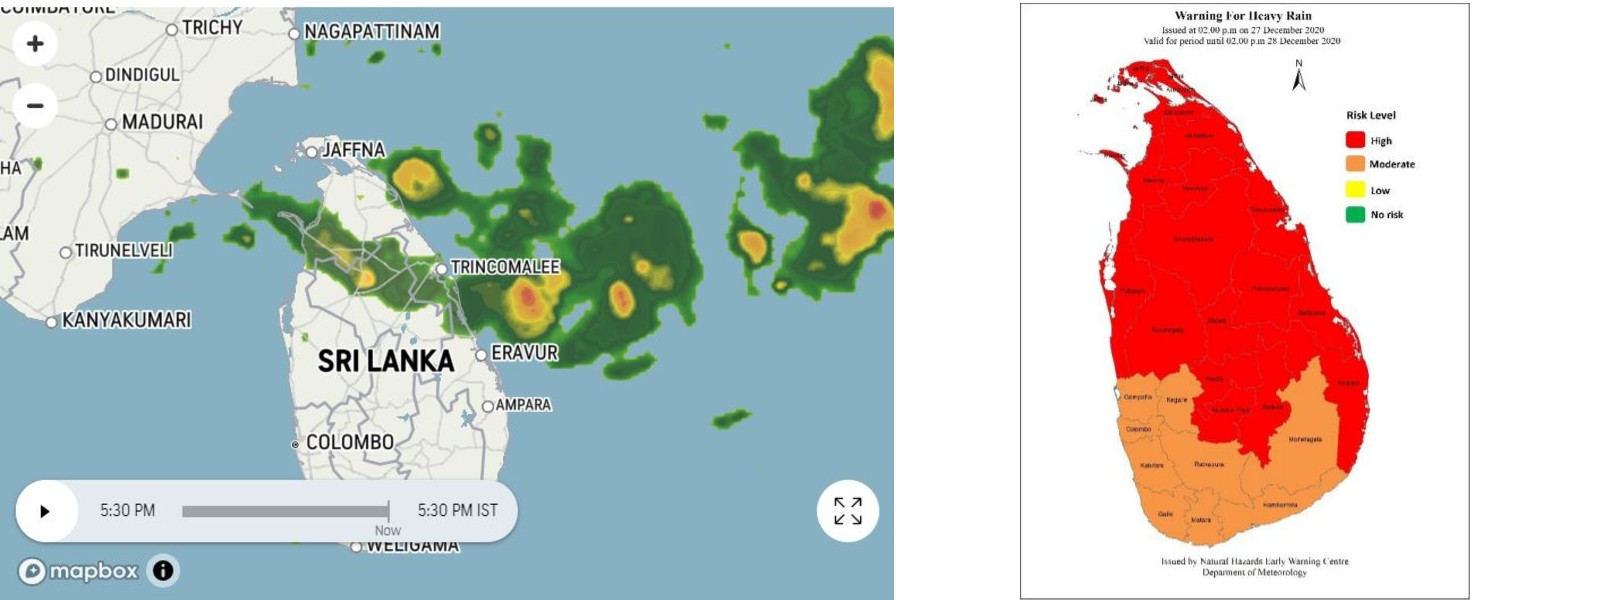 HEAVY RAIN WARNING ISSUED